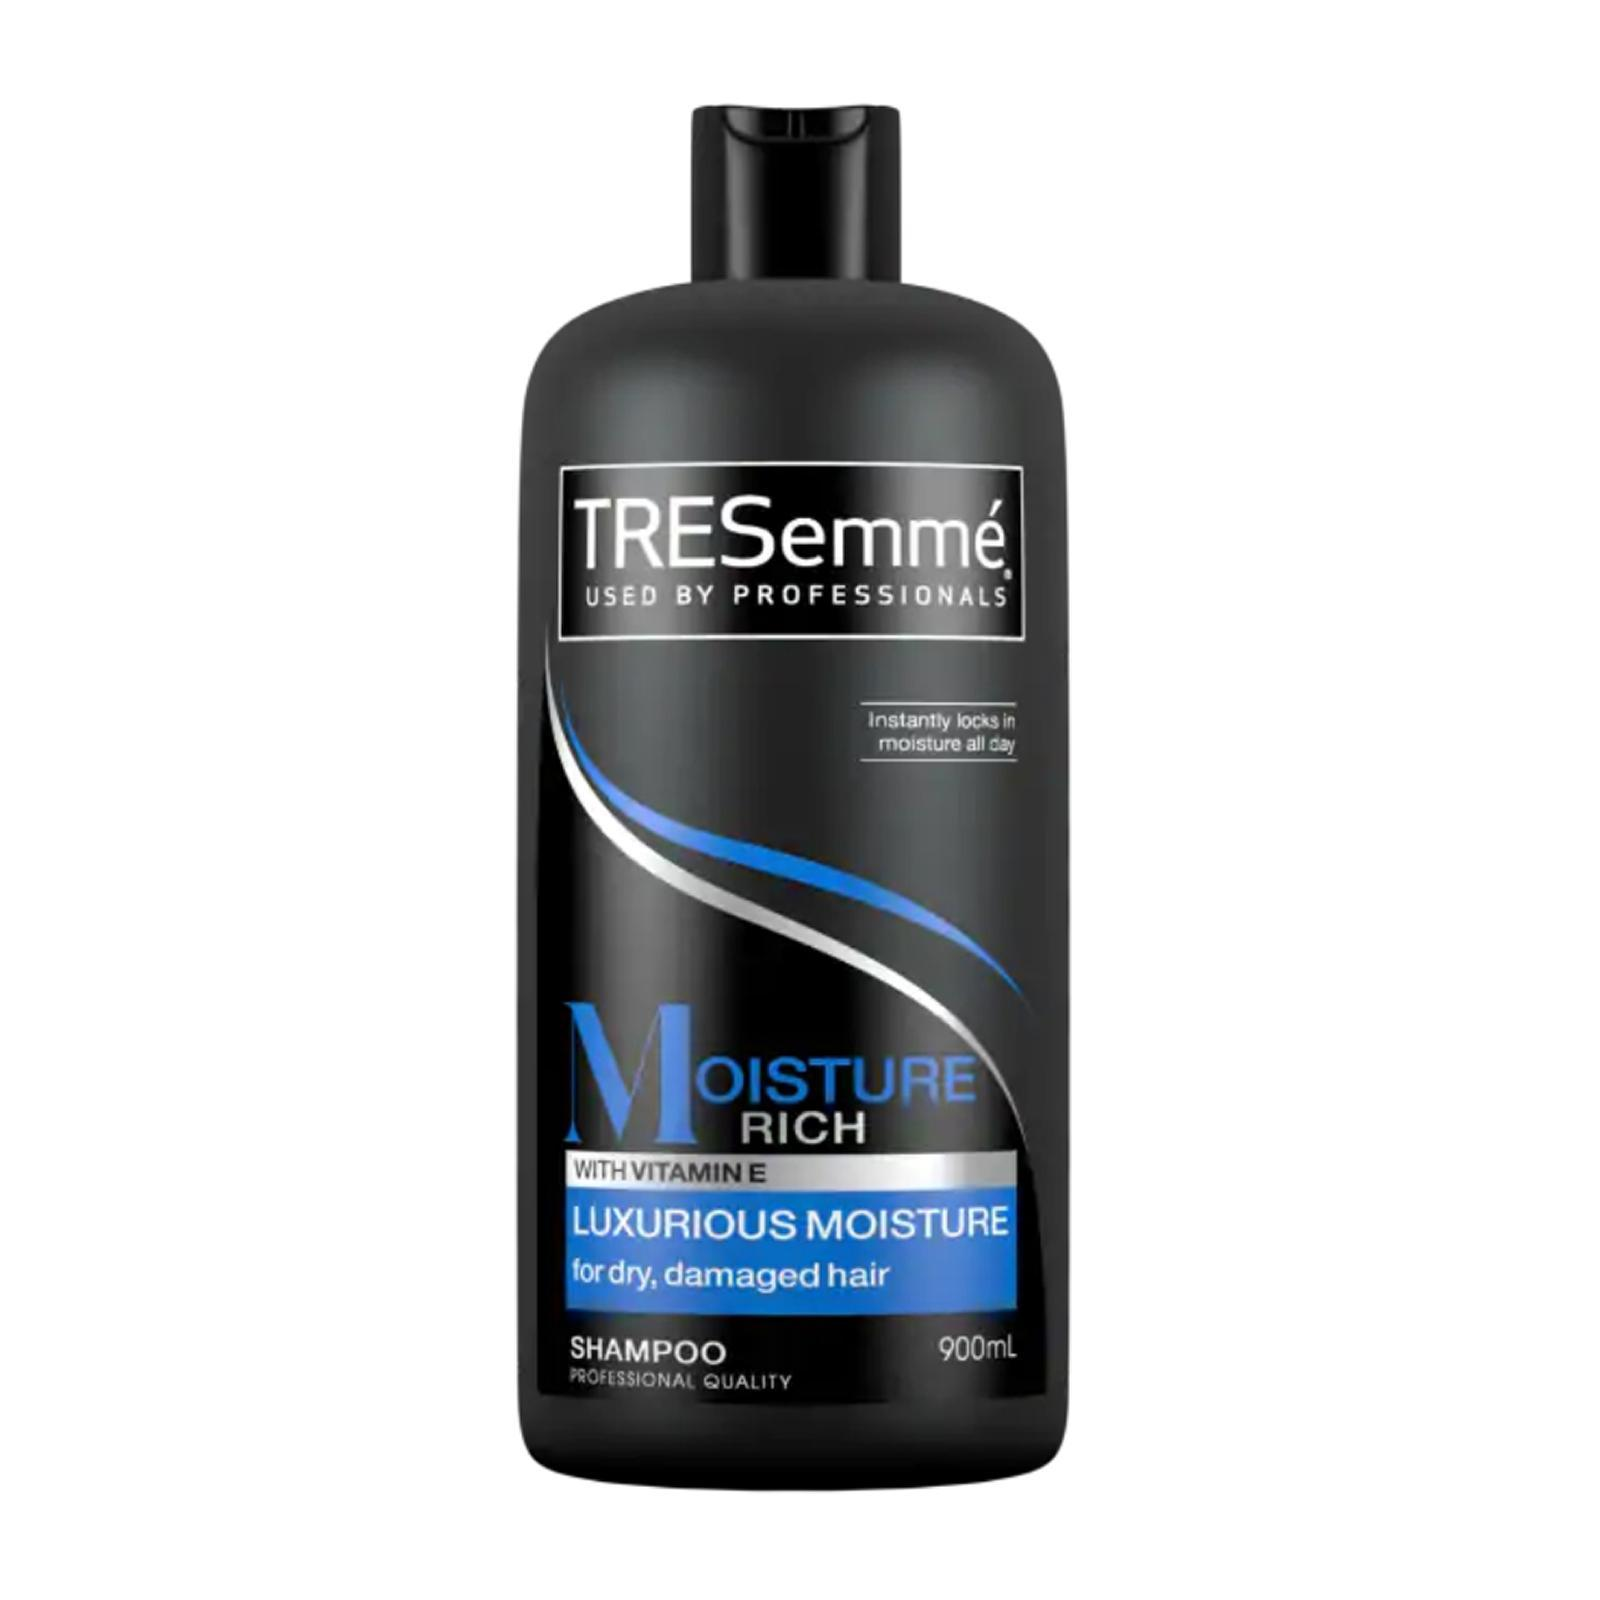 Tresemme Moisture Rich Luxurious Moisture Shampoo - By Beauty Language